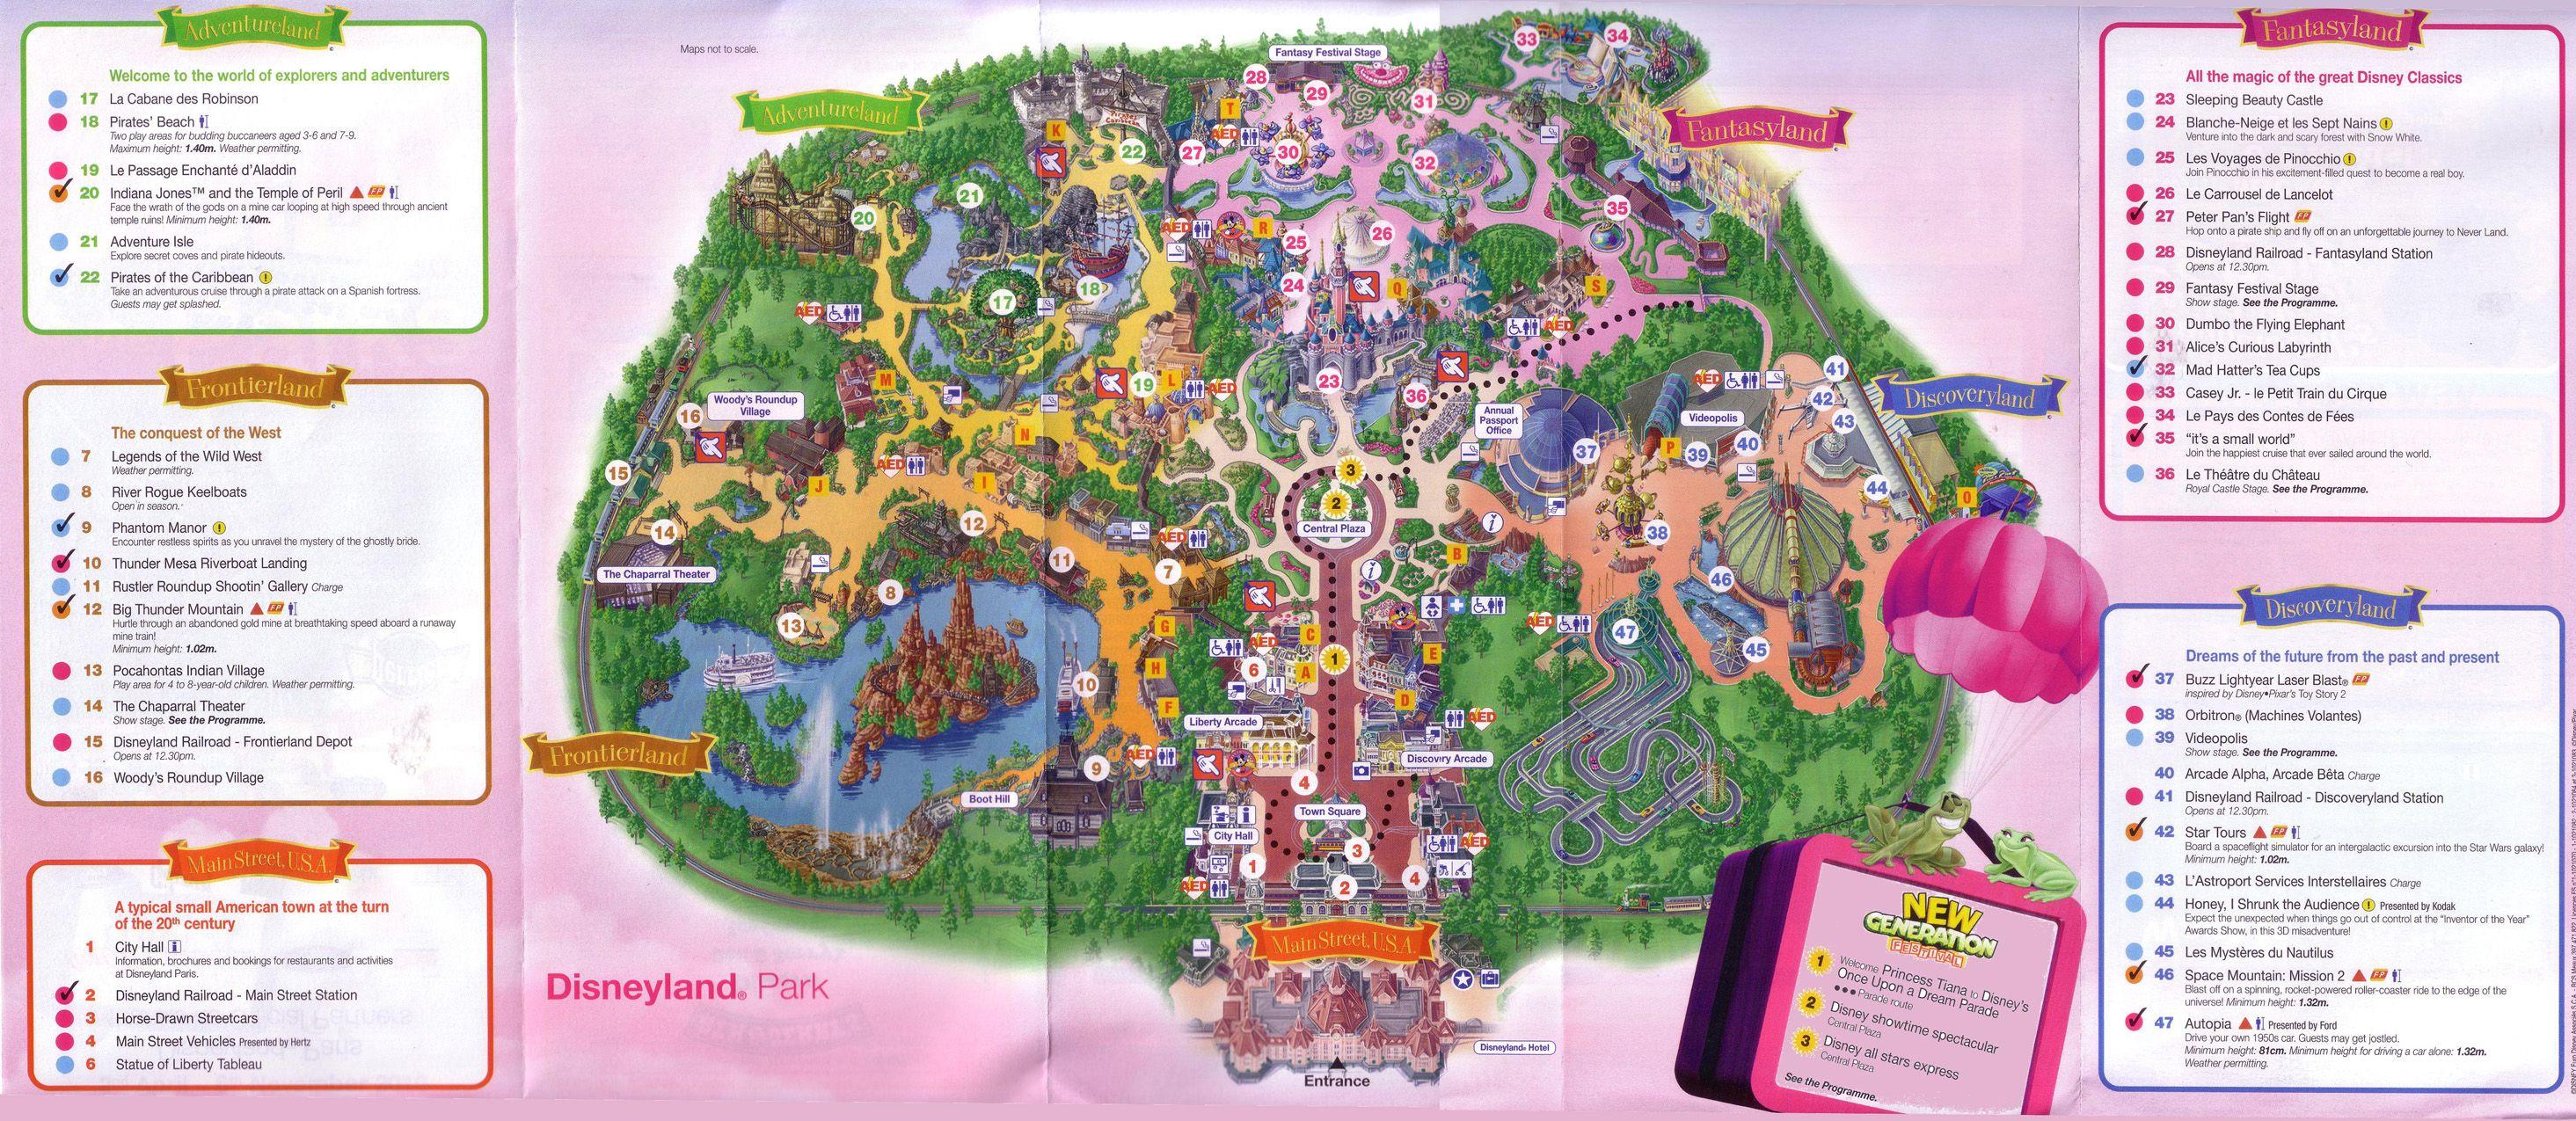 Disneyland Paris 2010 in 2019 Disneyland paris, Disney